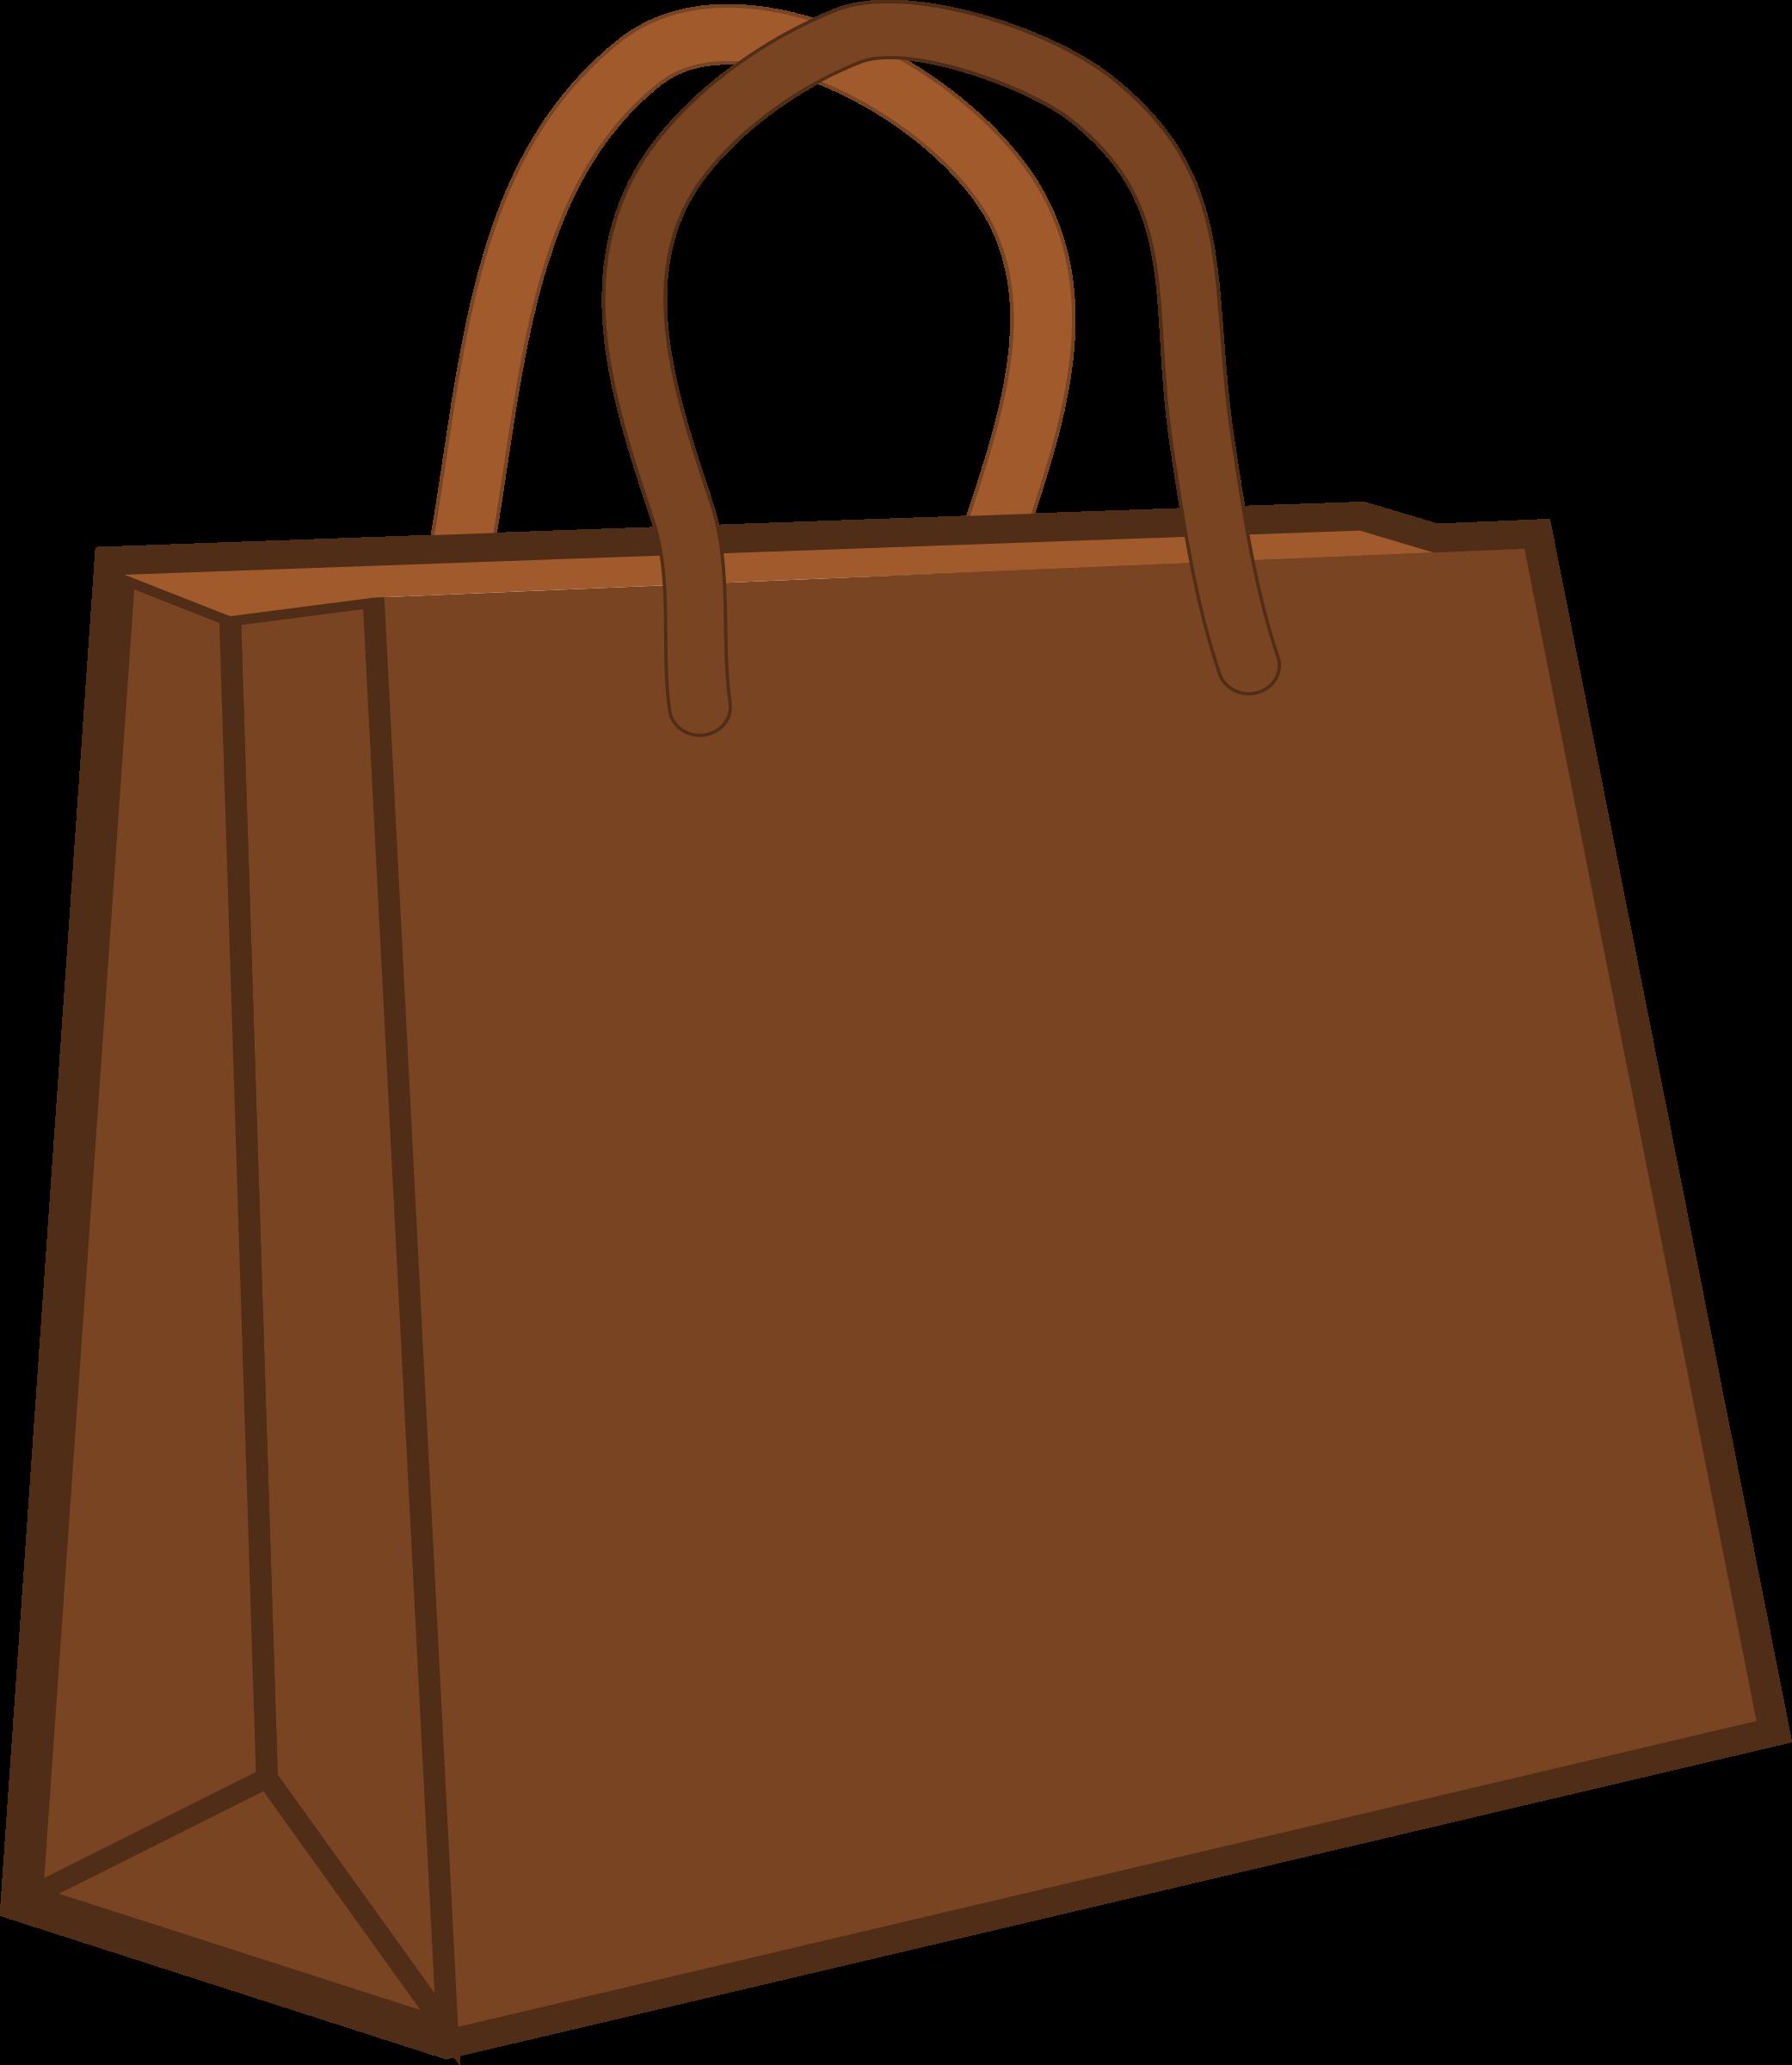 clipart paper shopping bag